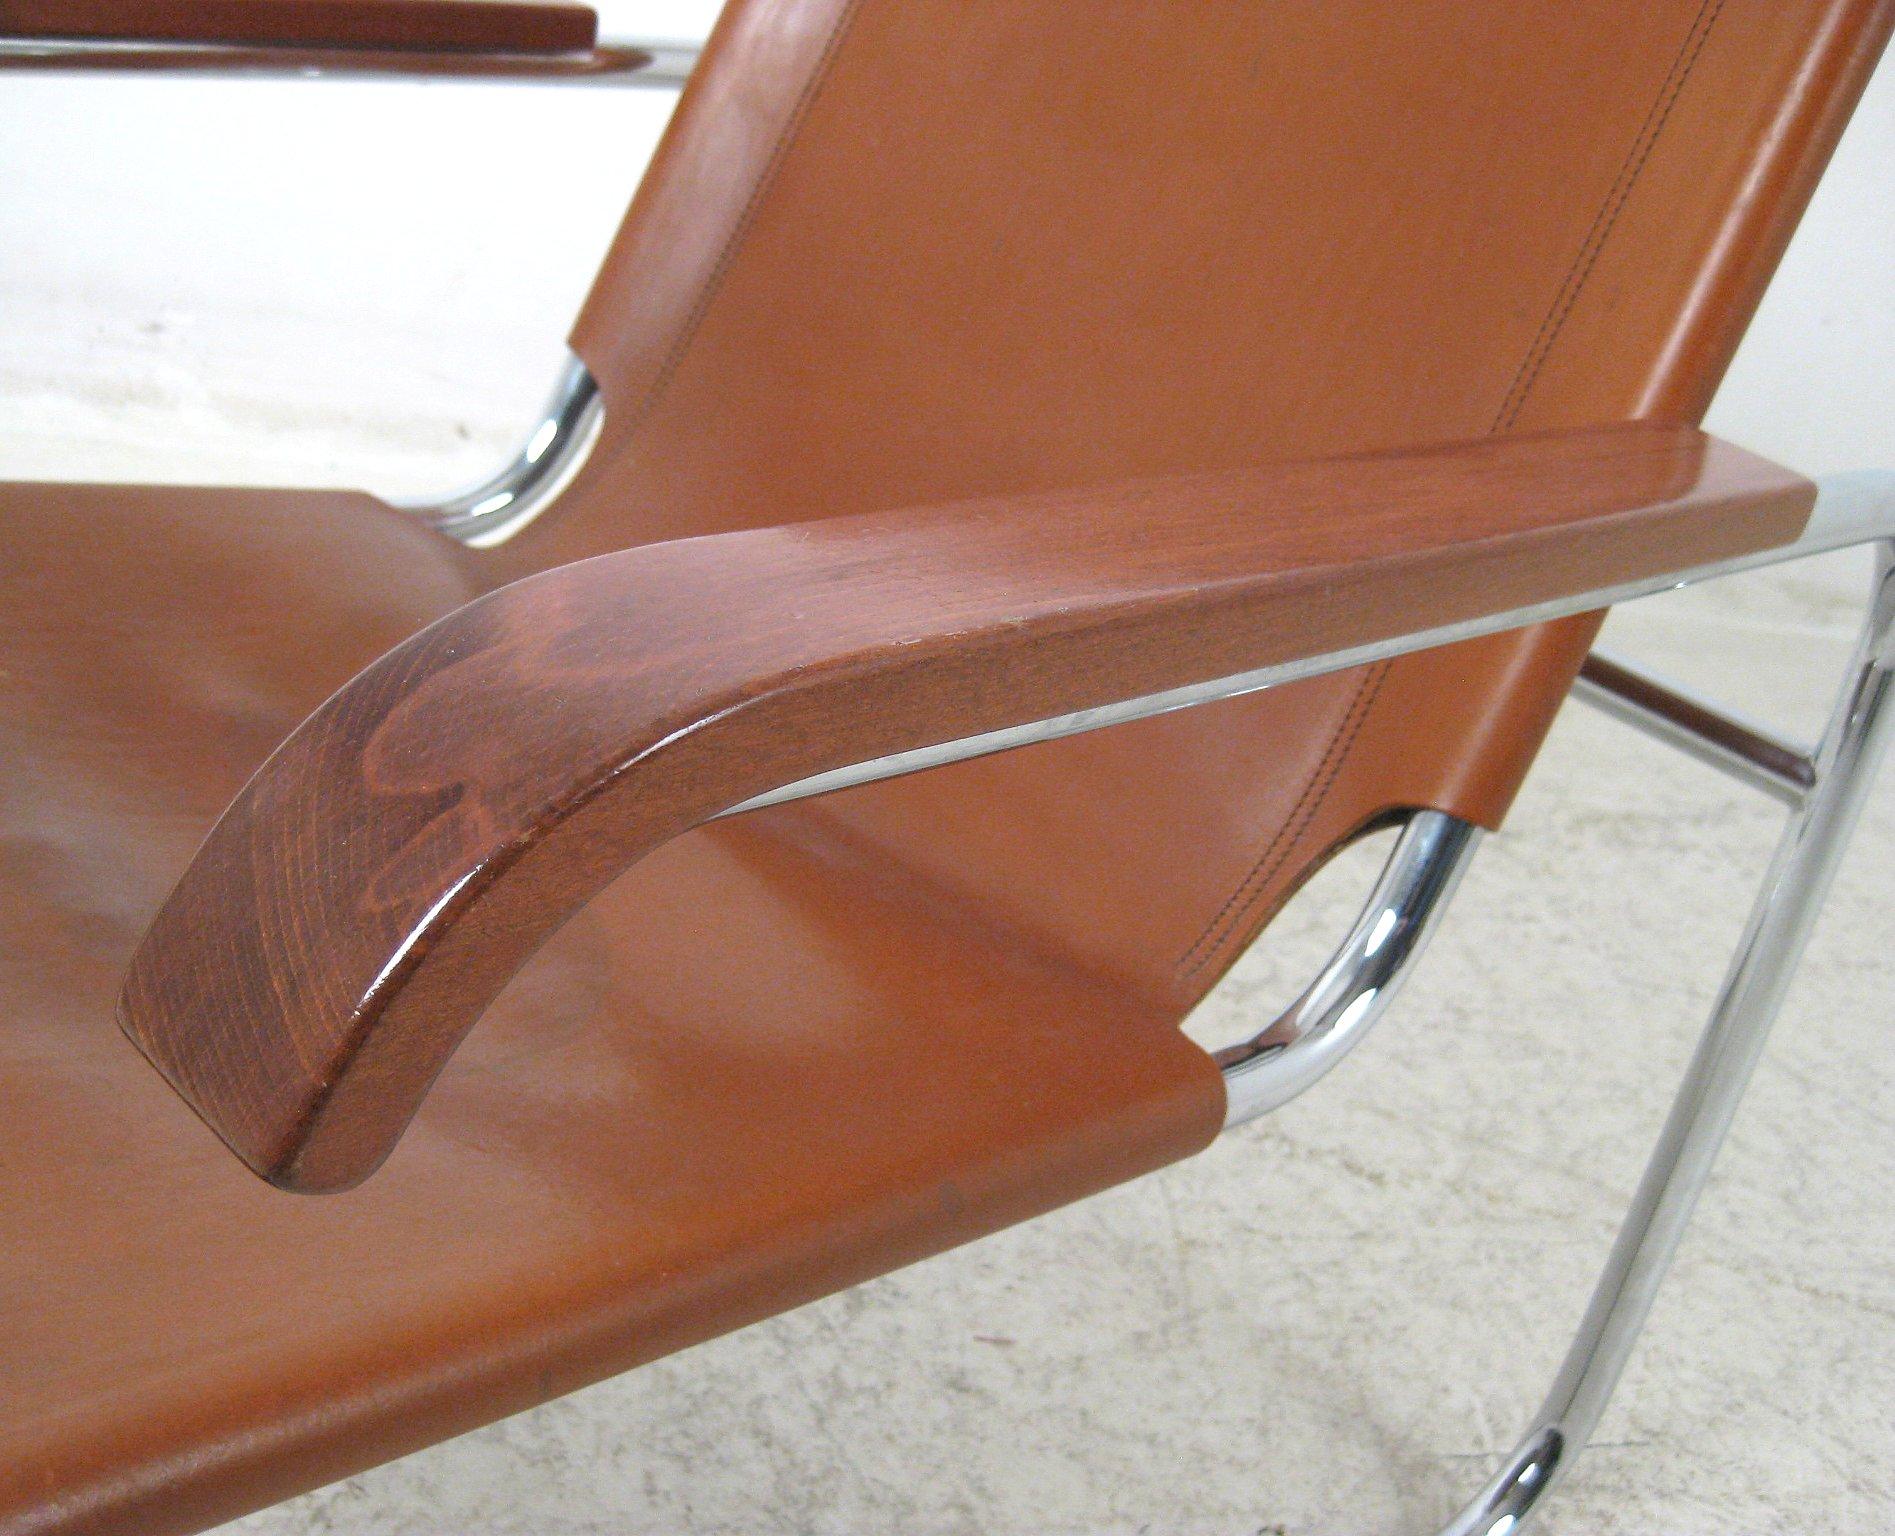 Marcel Breuer, pair of tubular steel chairs model B 35 by Thonet (2)